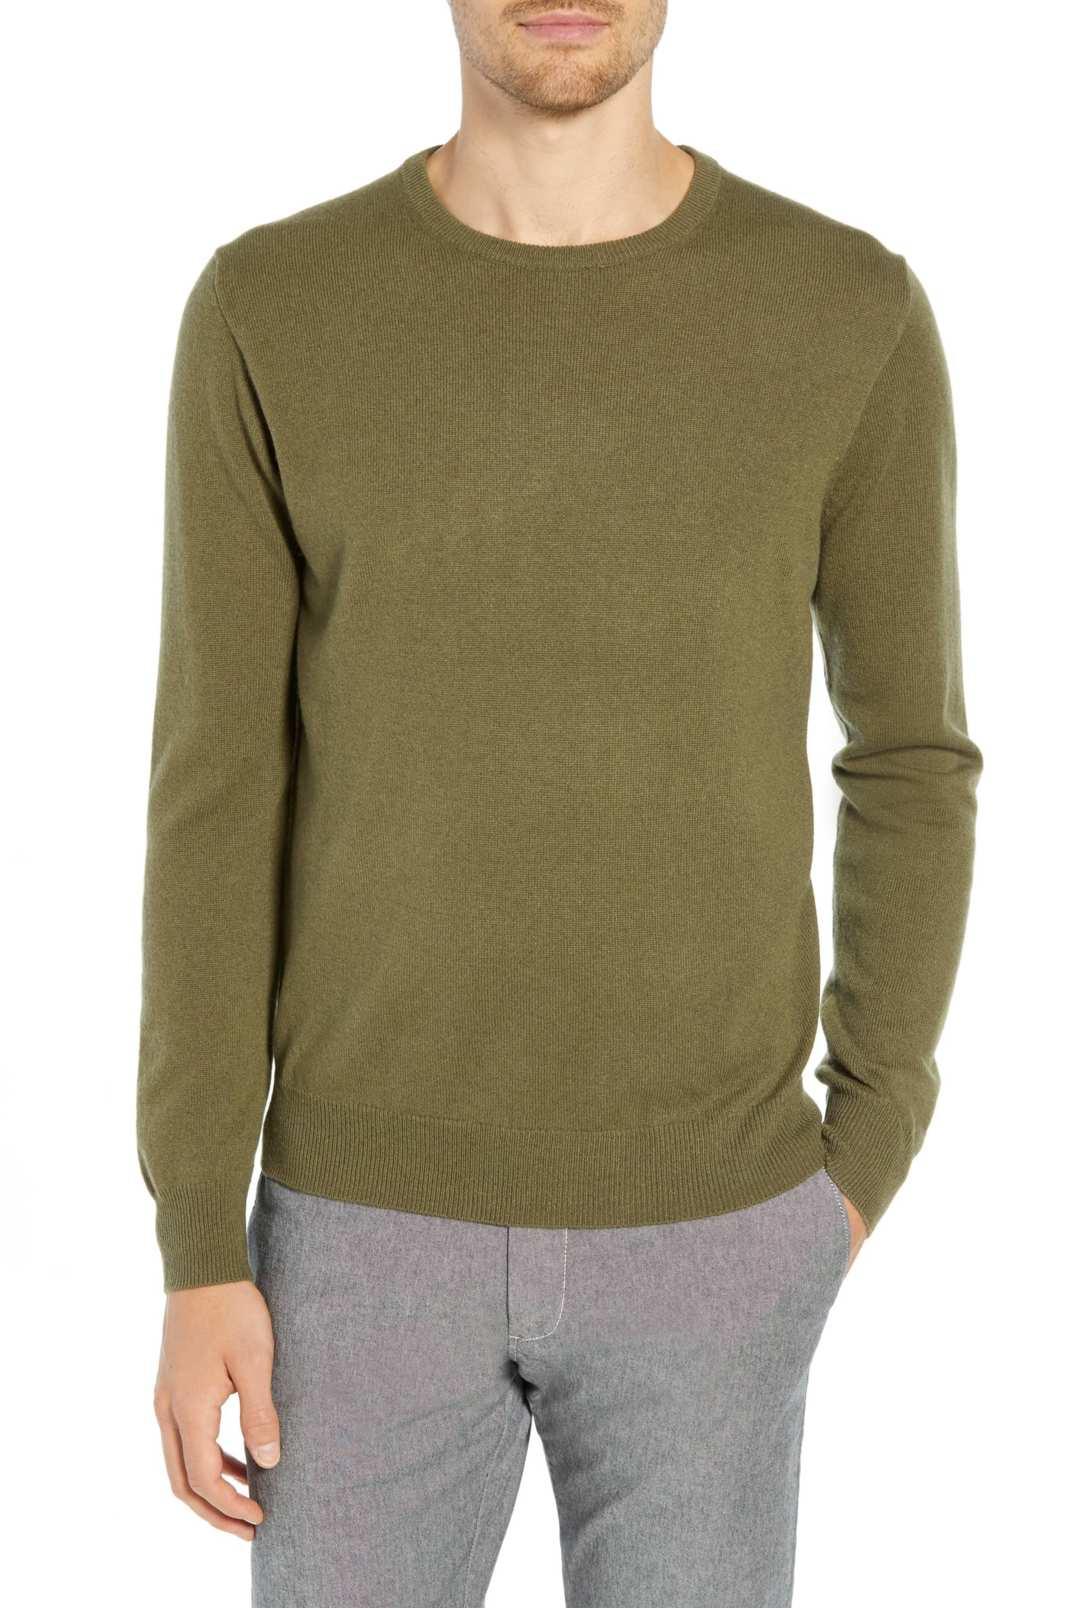 J.Crew Everyday Cashmere Regular Fit Crewneck Sweater